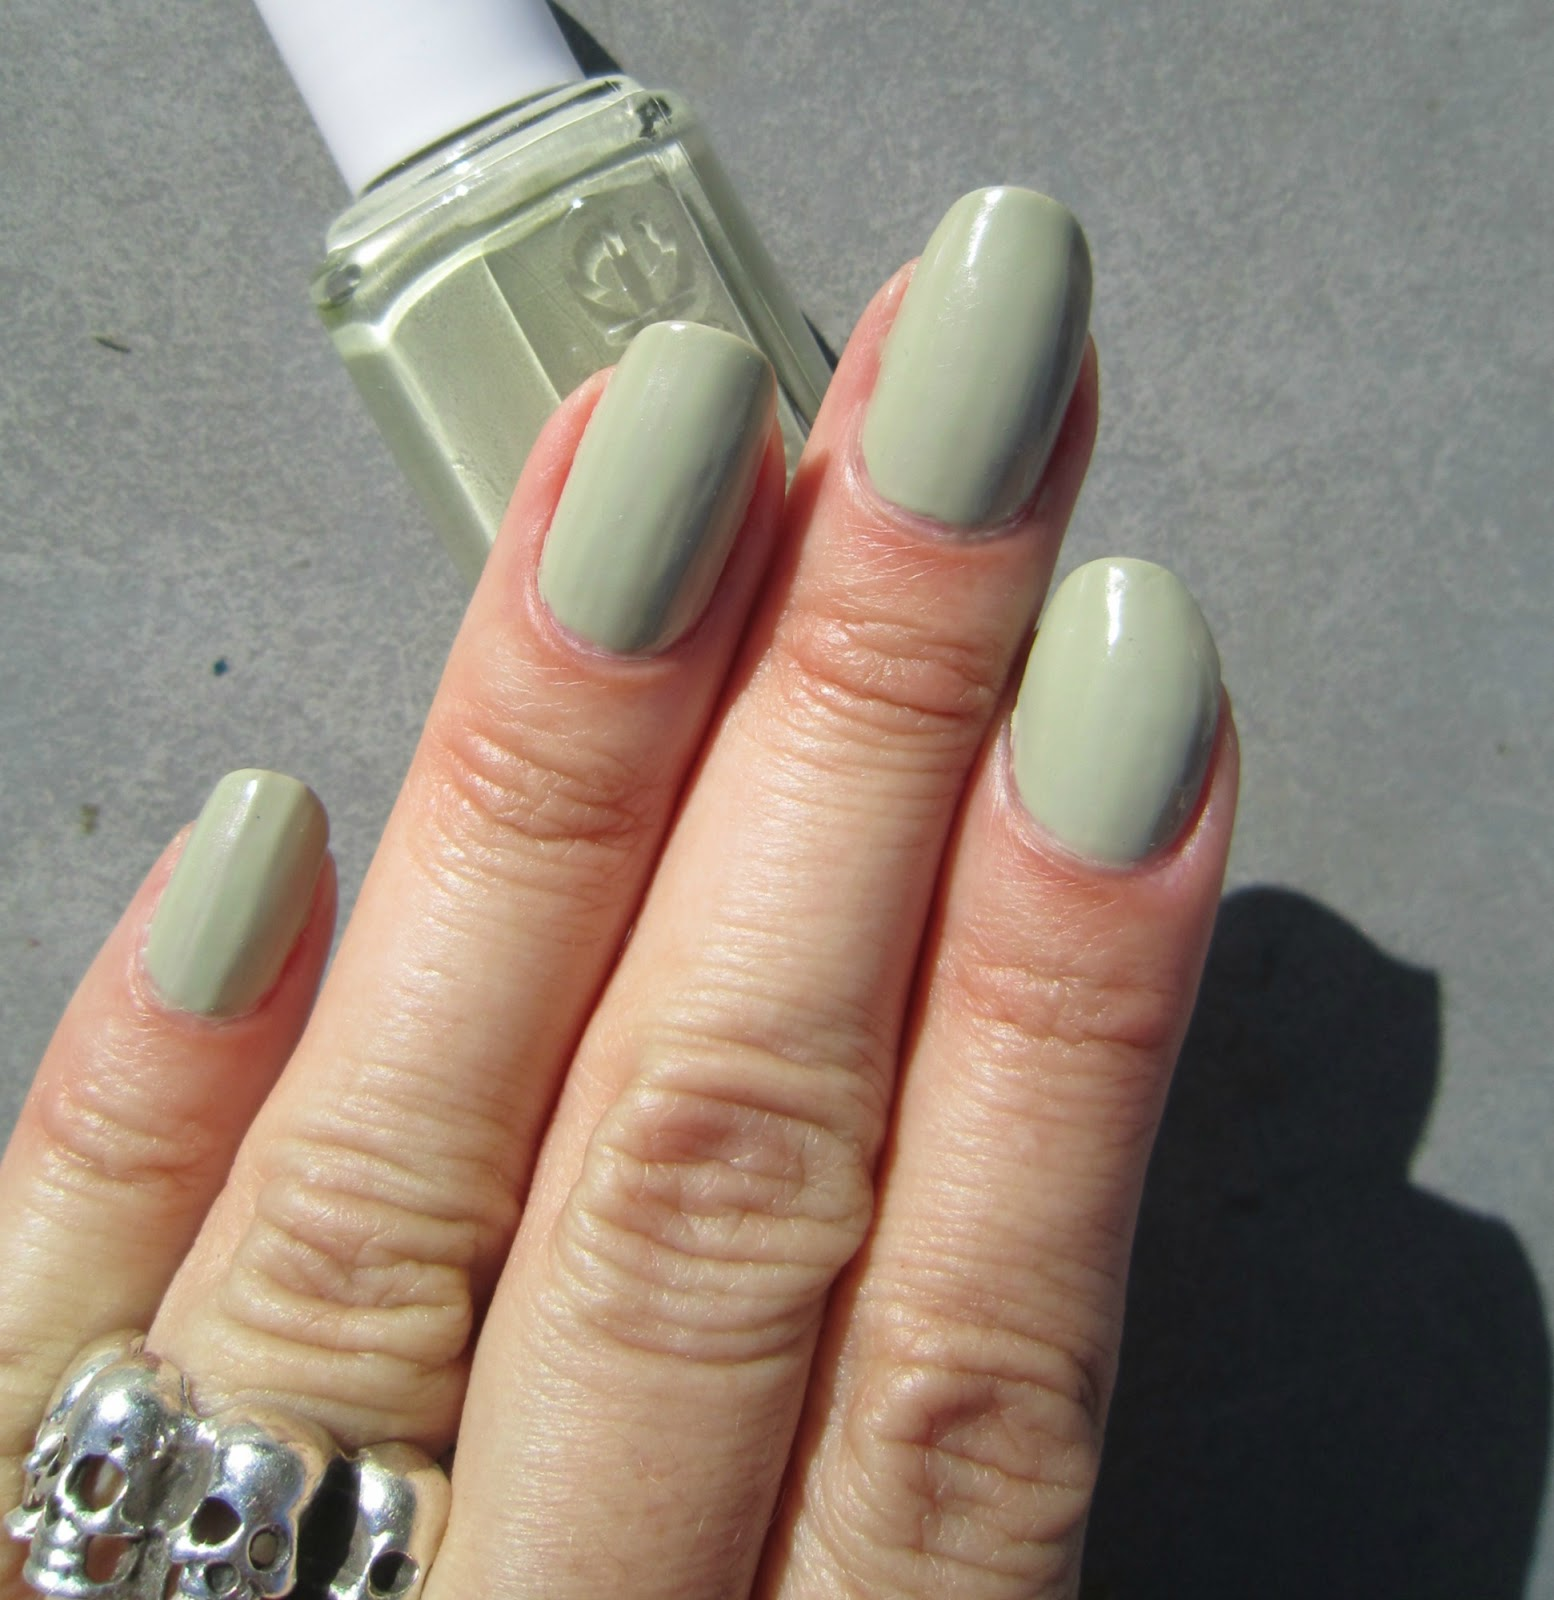 Concrete and Nail Polish: Essie